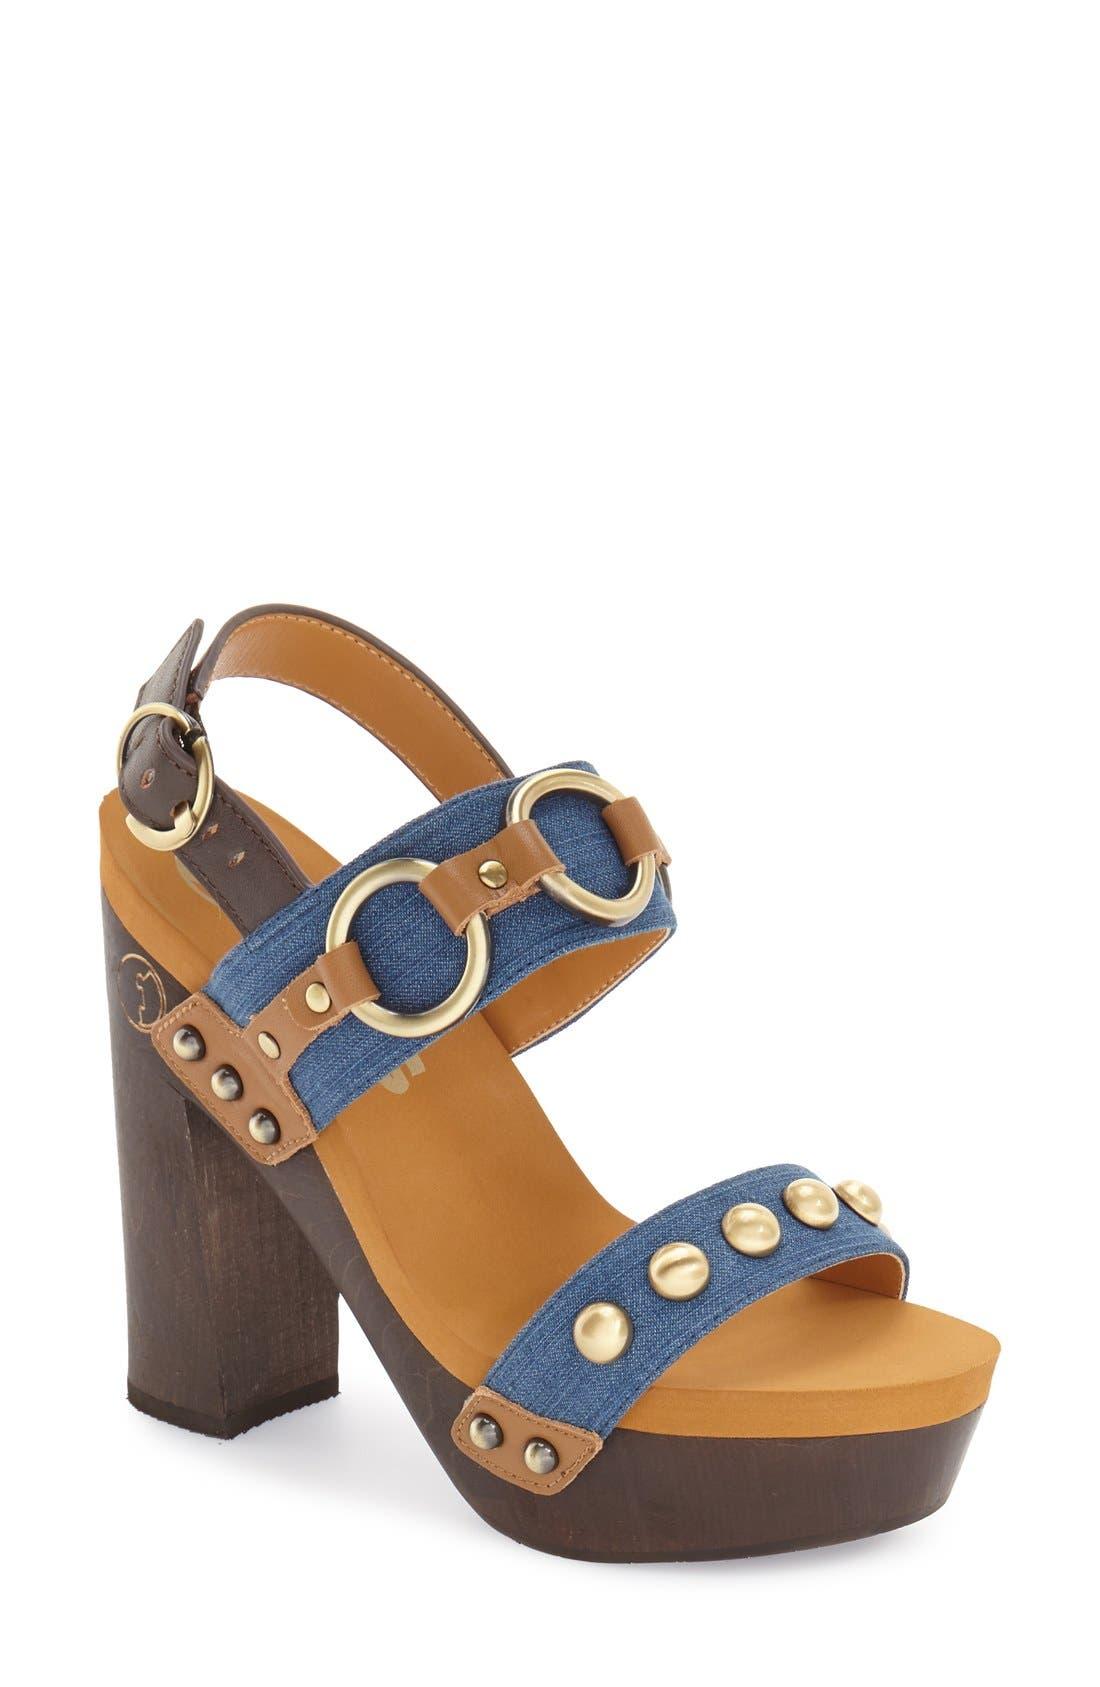 Main Image - Flogg 'Entrada' Stud Harness Platform Sandal (Women)